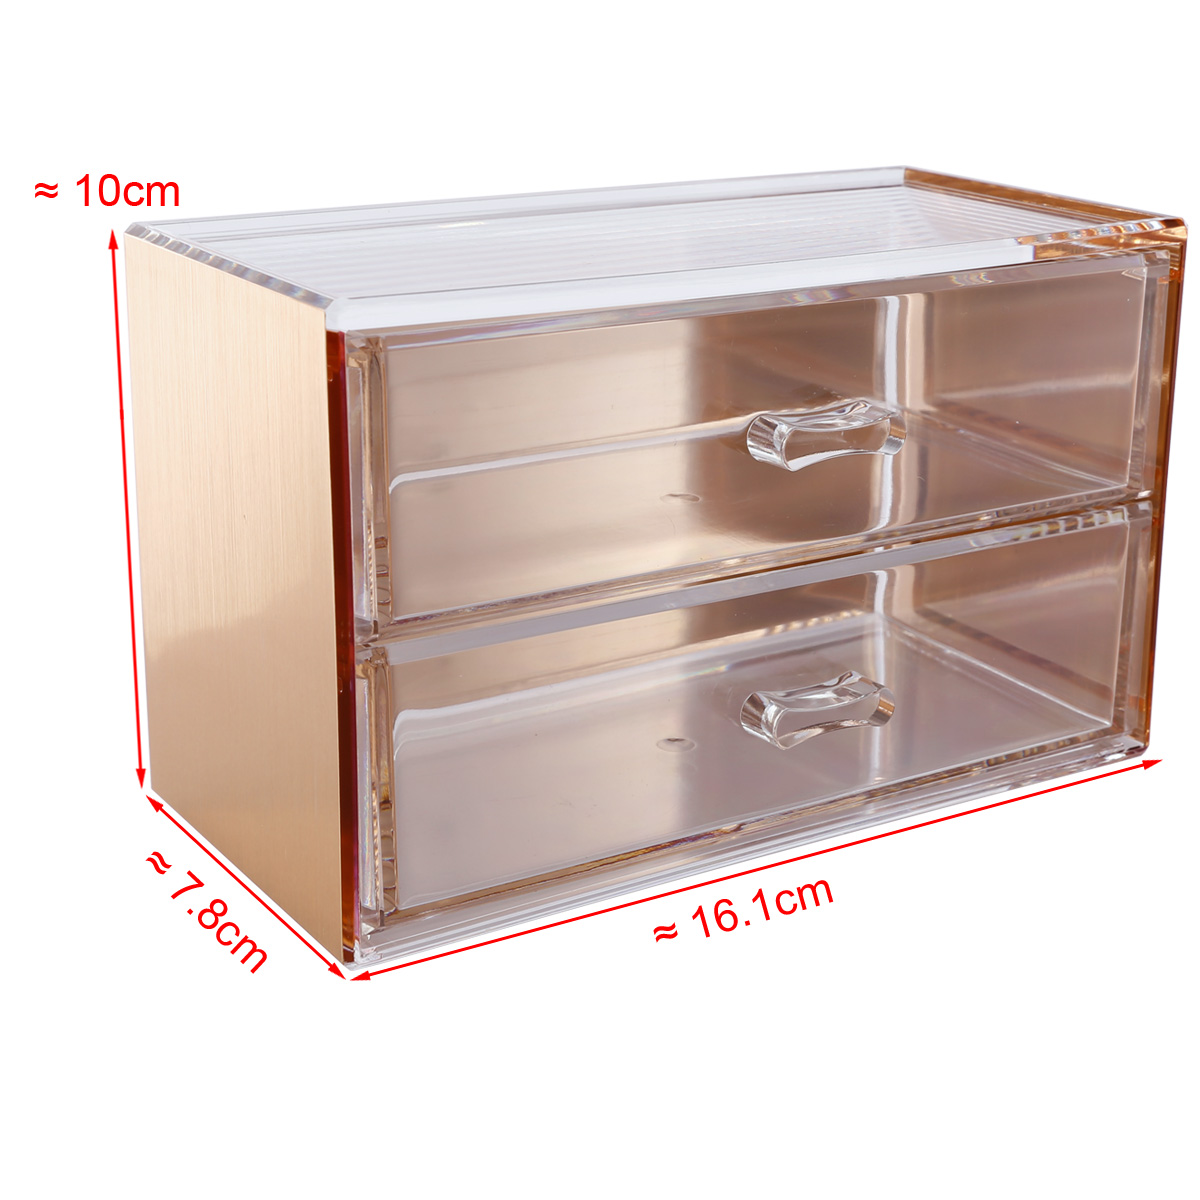 rosegold kosmetik organizer make up acryl aufbewahrung kosmetikbox auswahl ebay. Black Bedroom Furniture Sets. Home Design Ideas